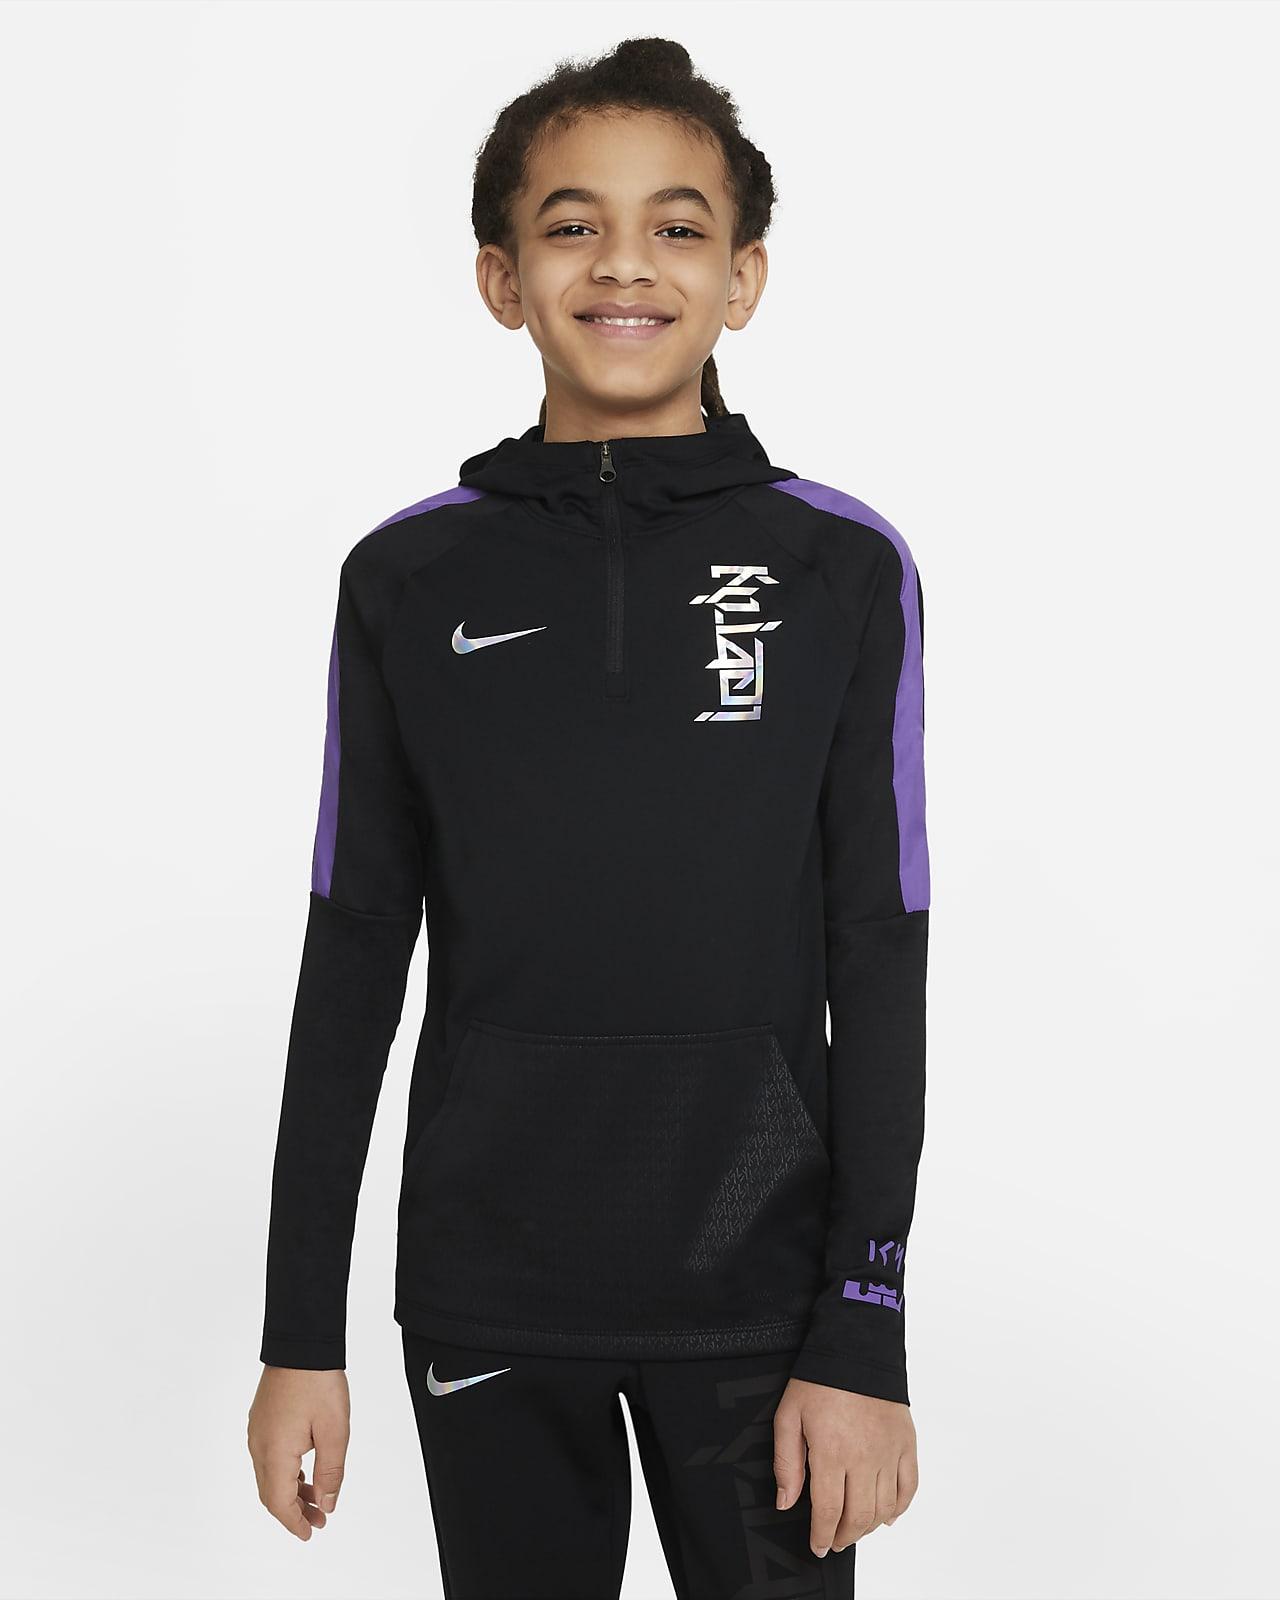 Nike Dri-FIT Kylian Mbappé Big Kids' Soccer Hoodie